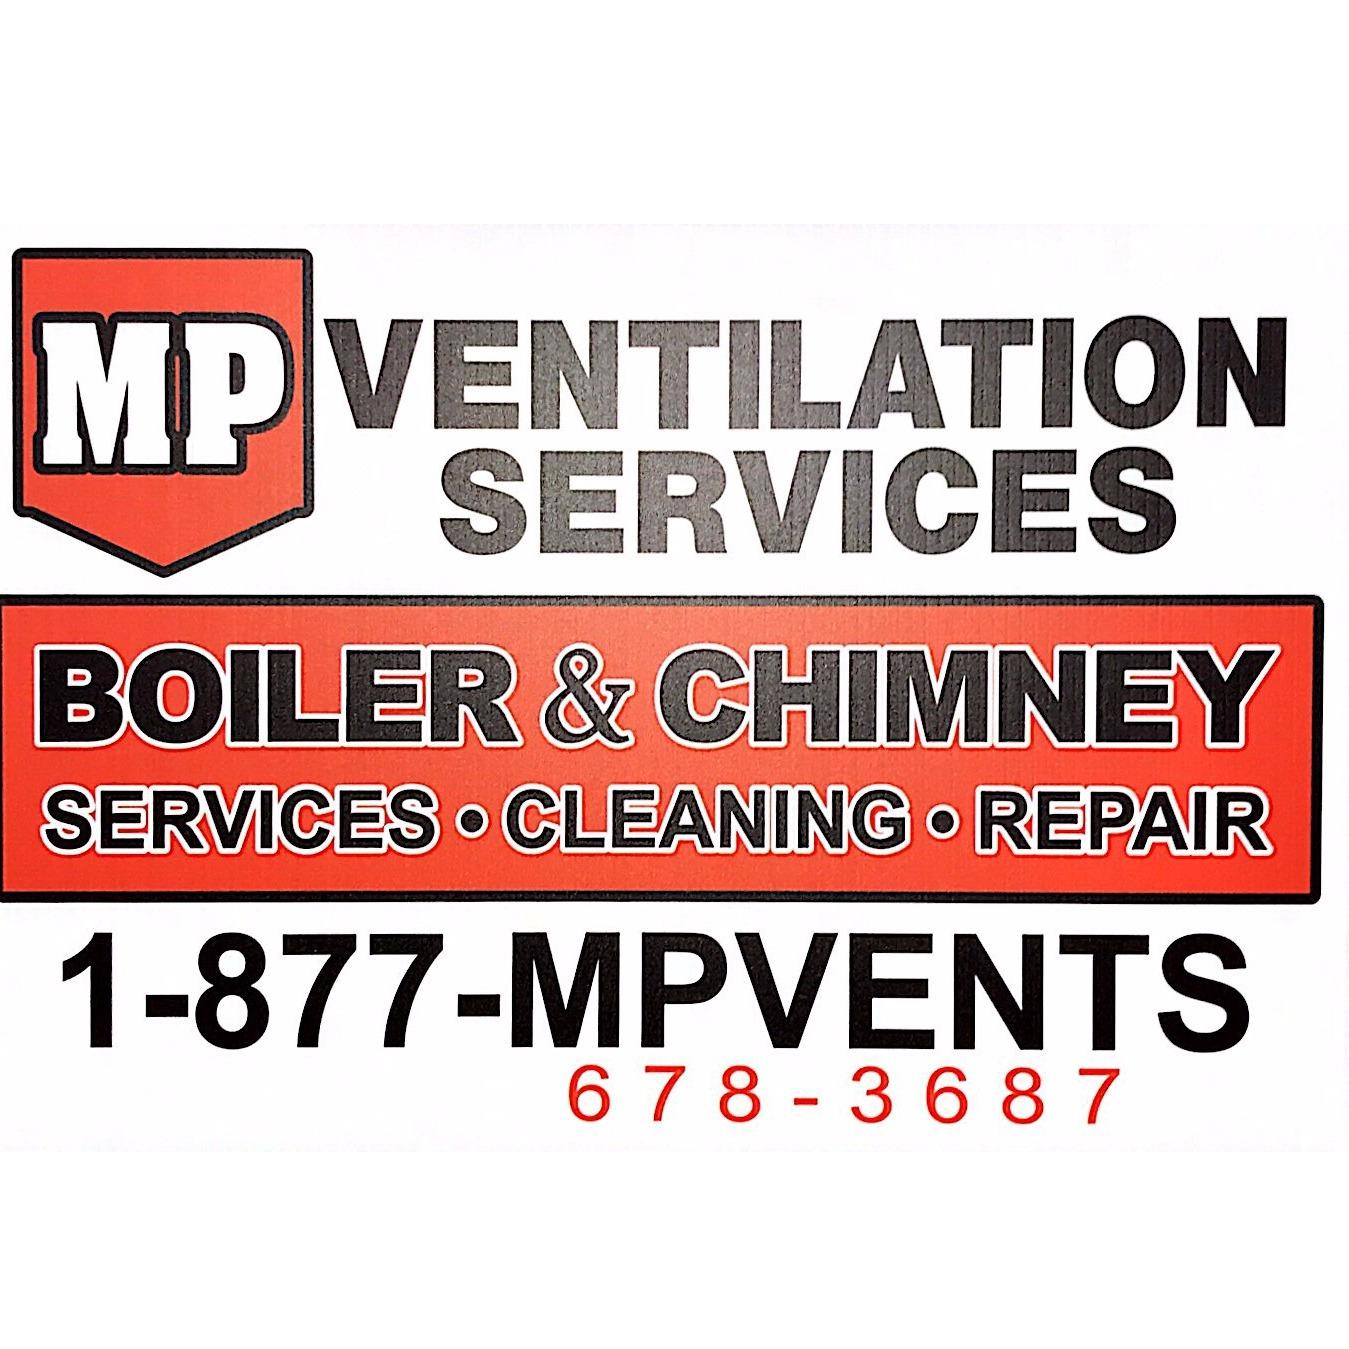 MP Ventilation Services